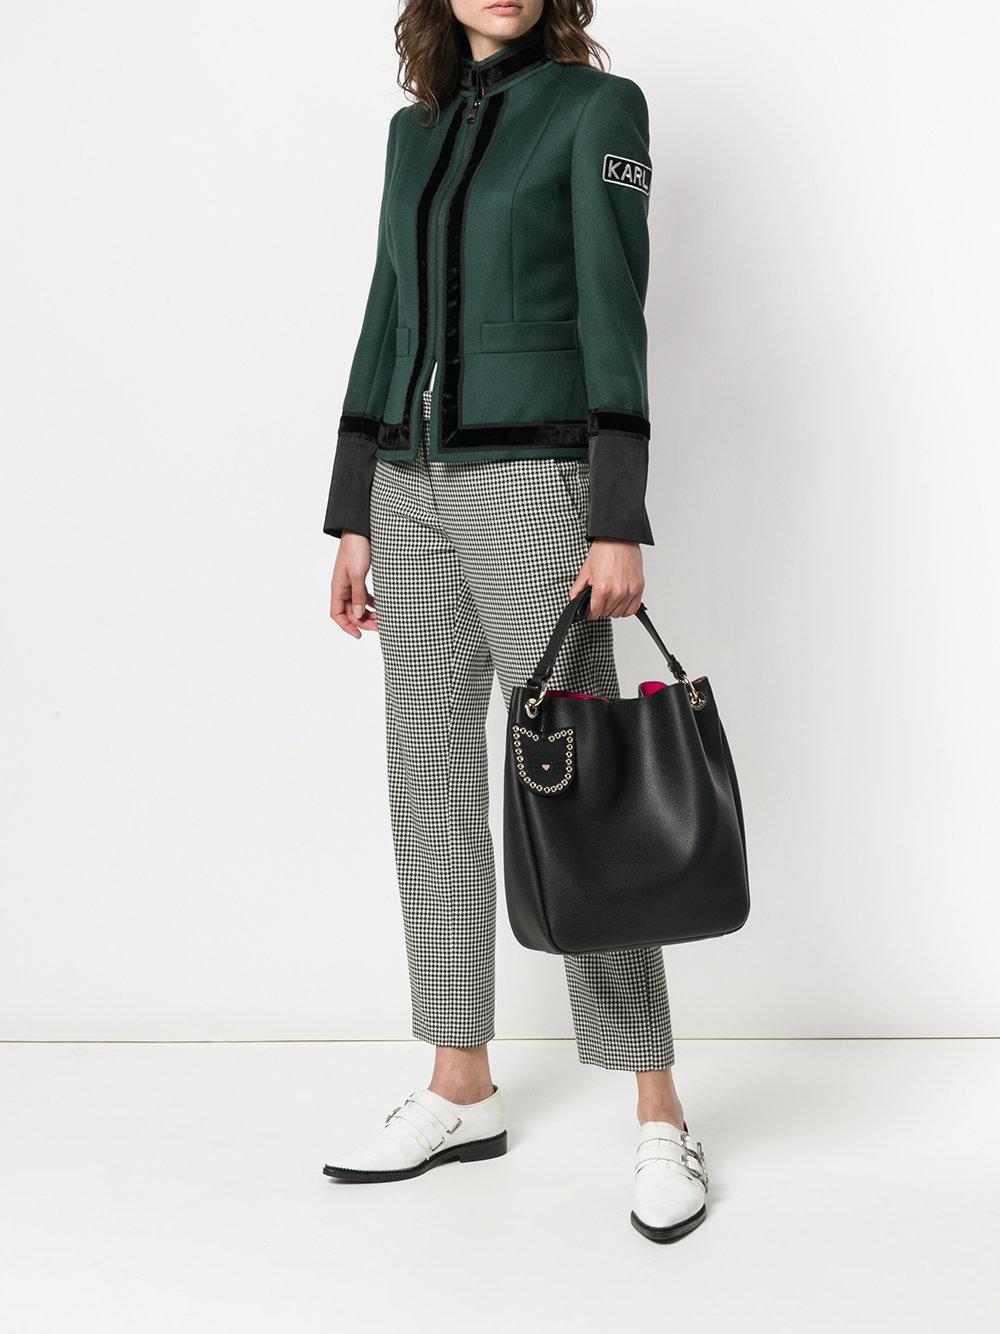 Karl Lagerfeld Leather Karry All Hobo Tote Bag in Black